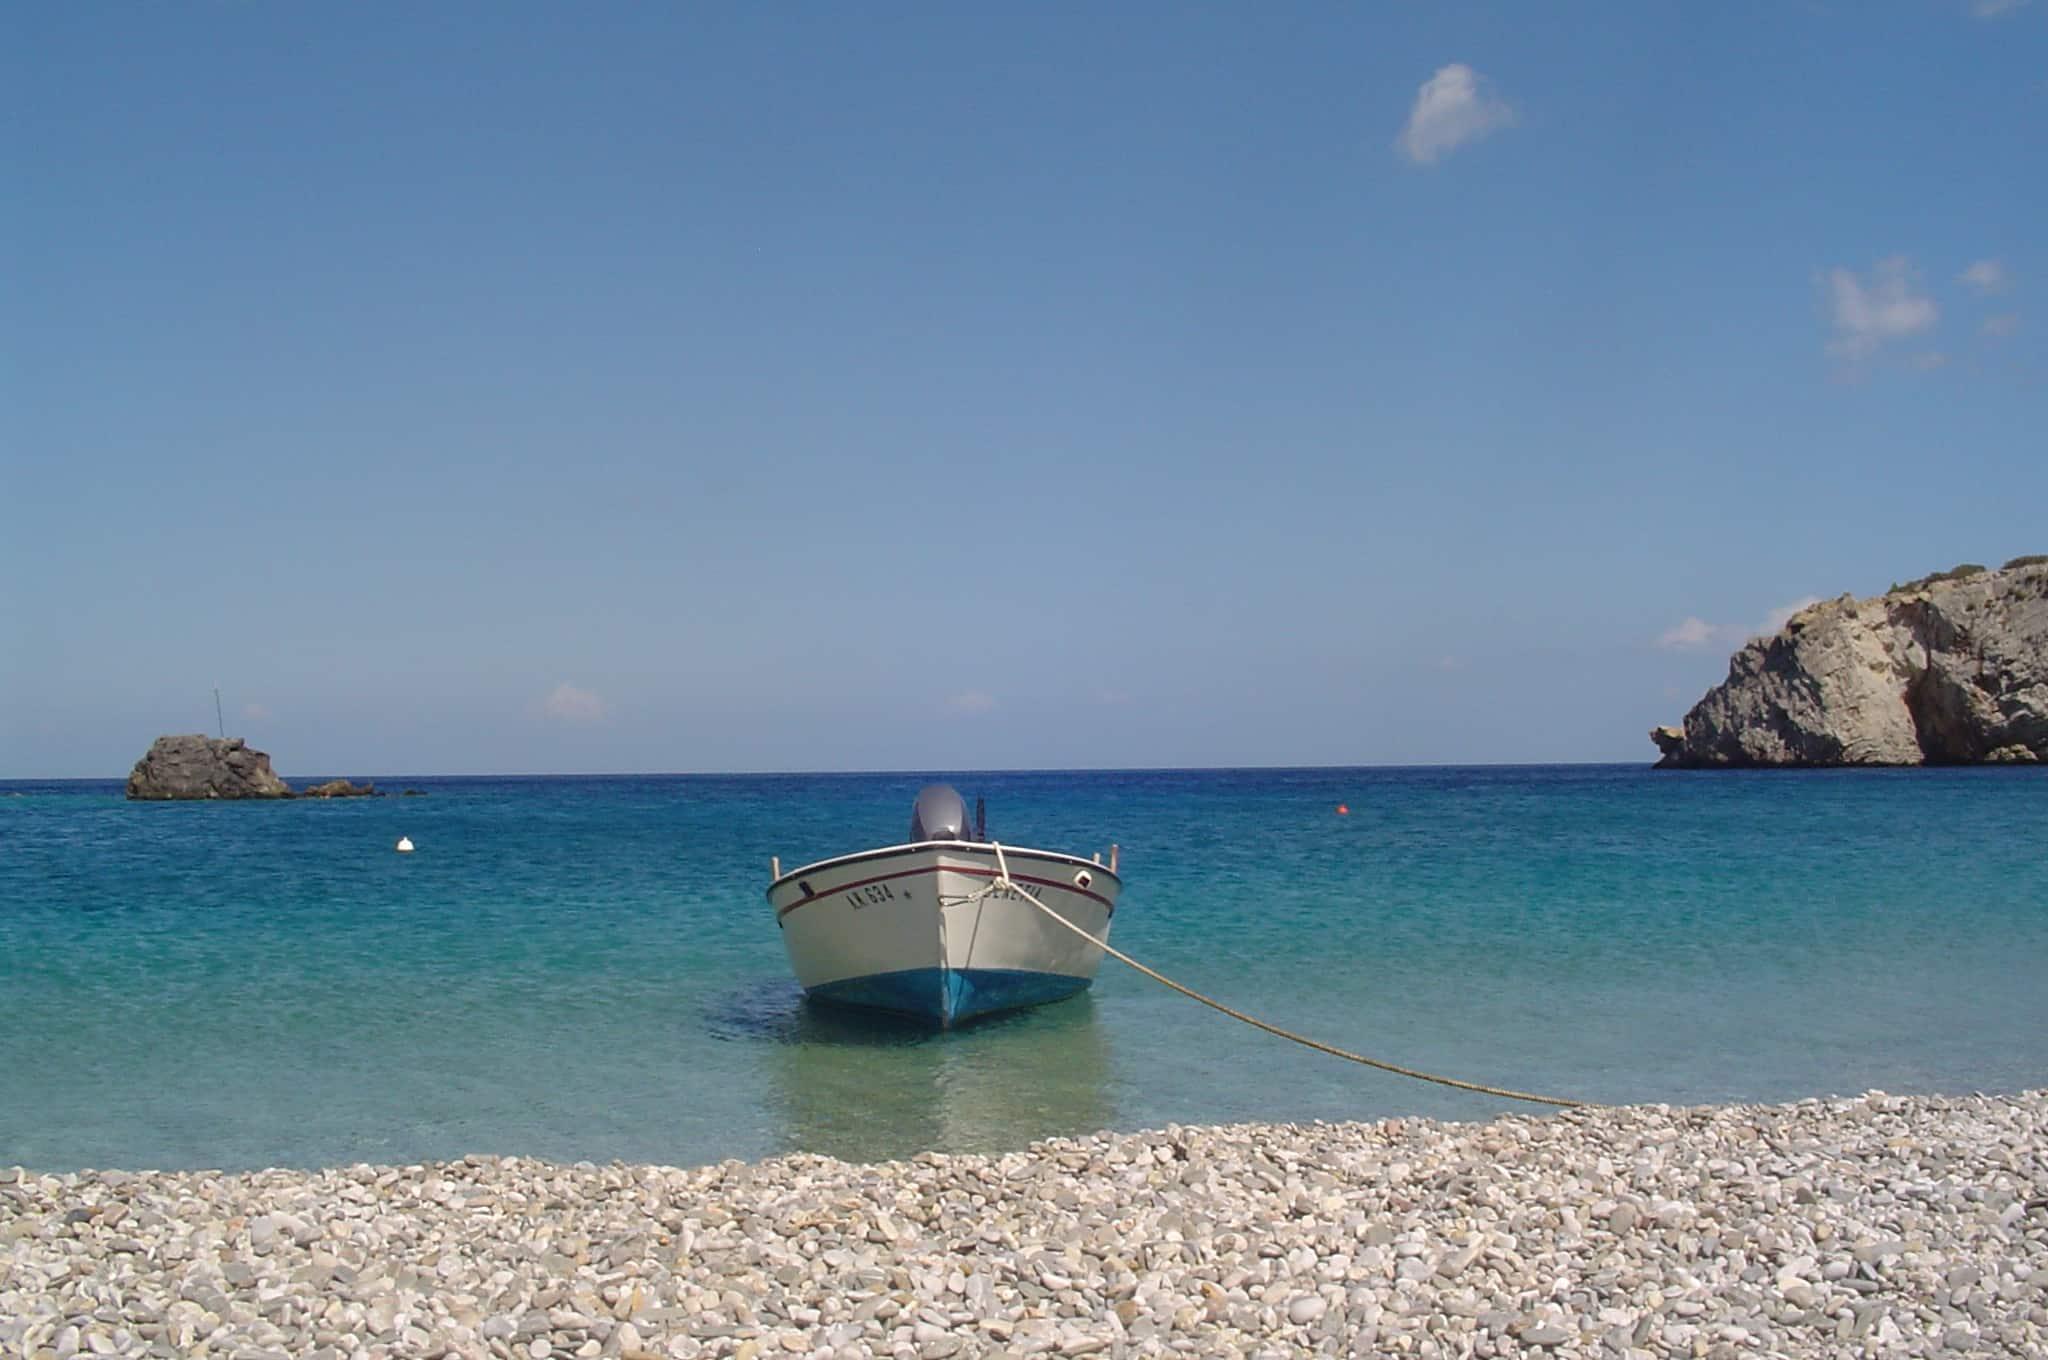 karpathos, grecia, mediterraneo